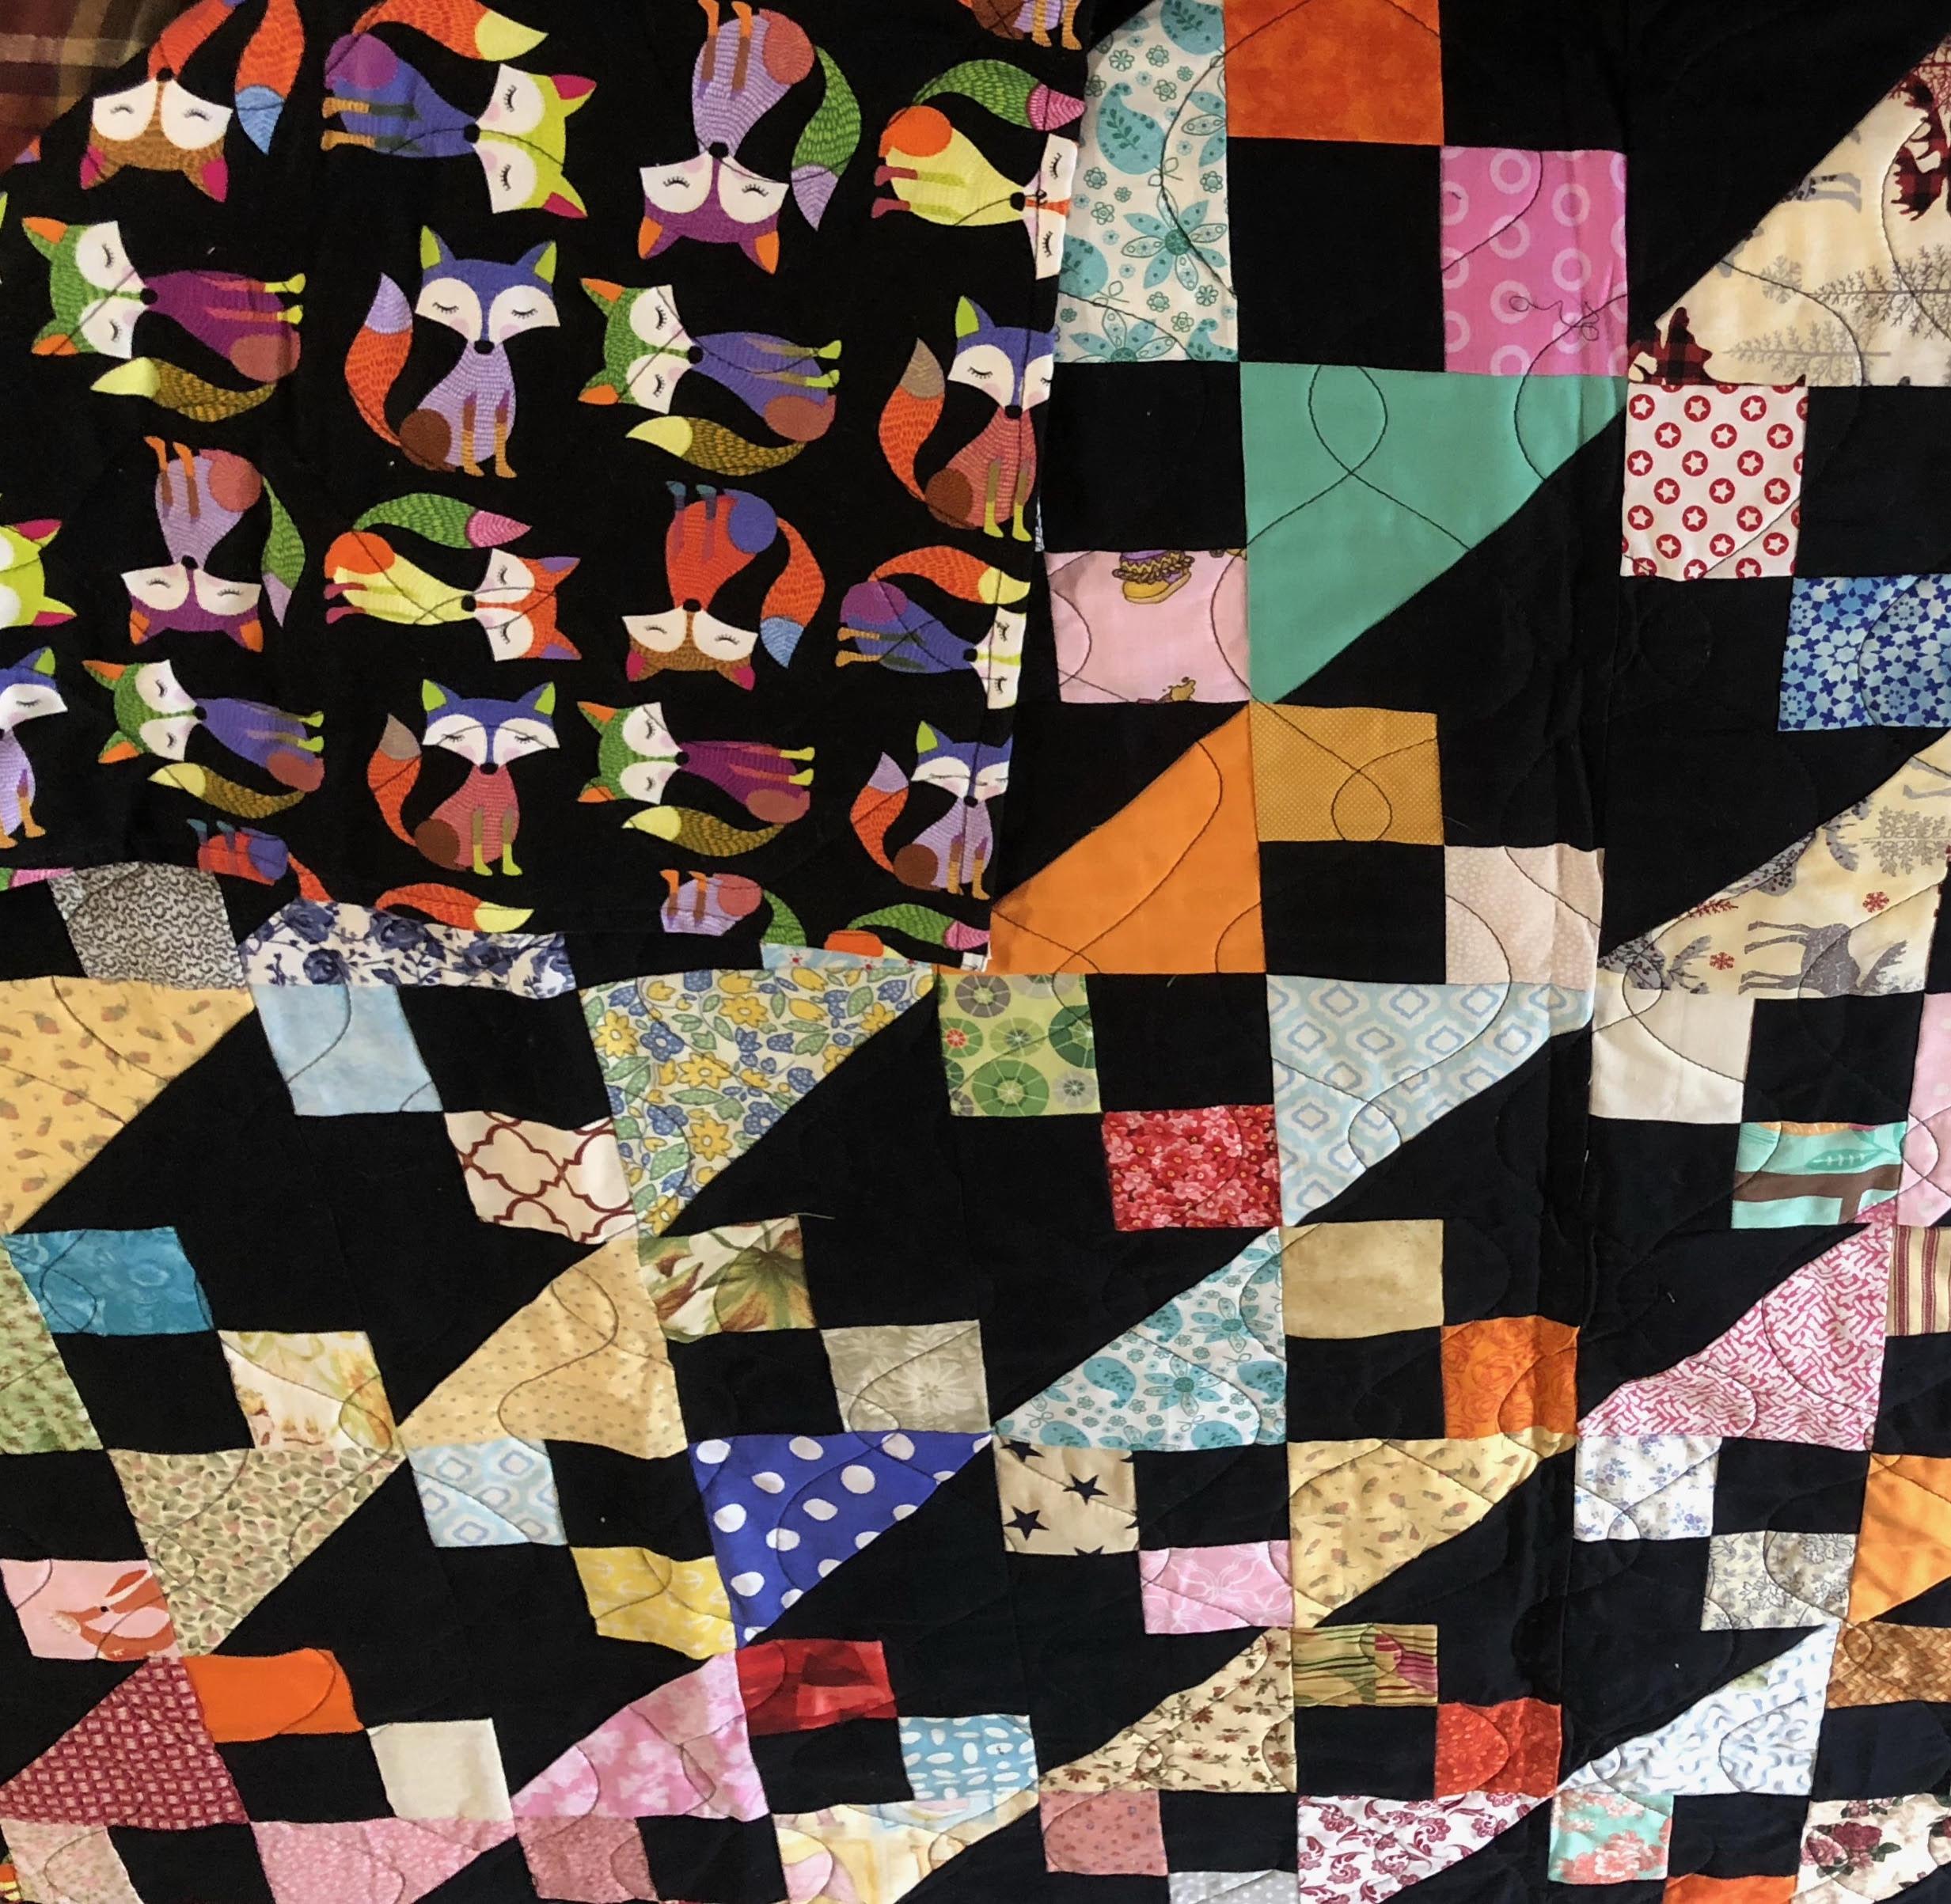 Fox Print Quilt for raffle